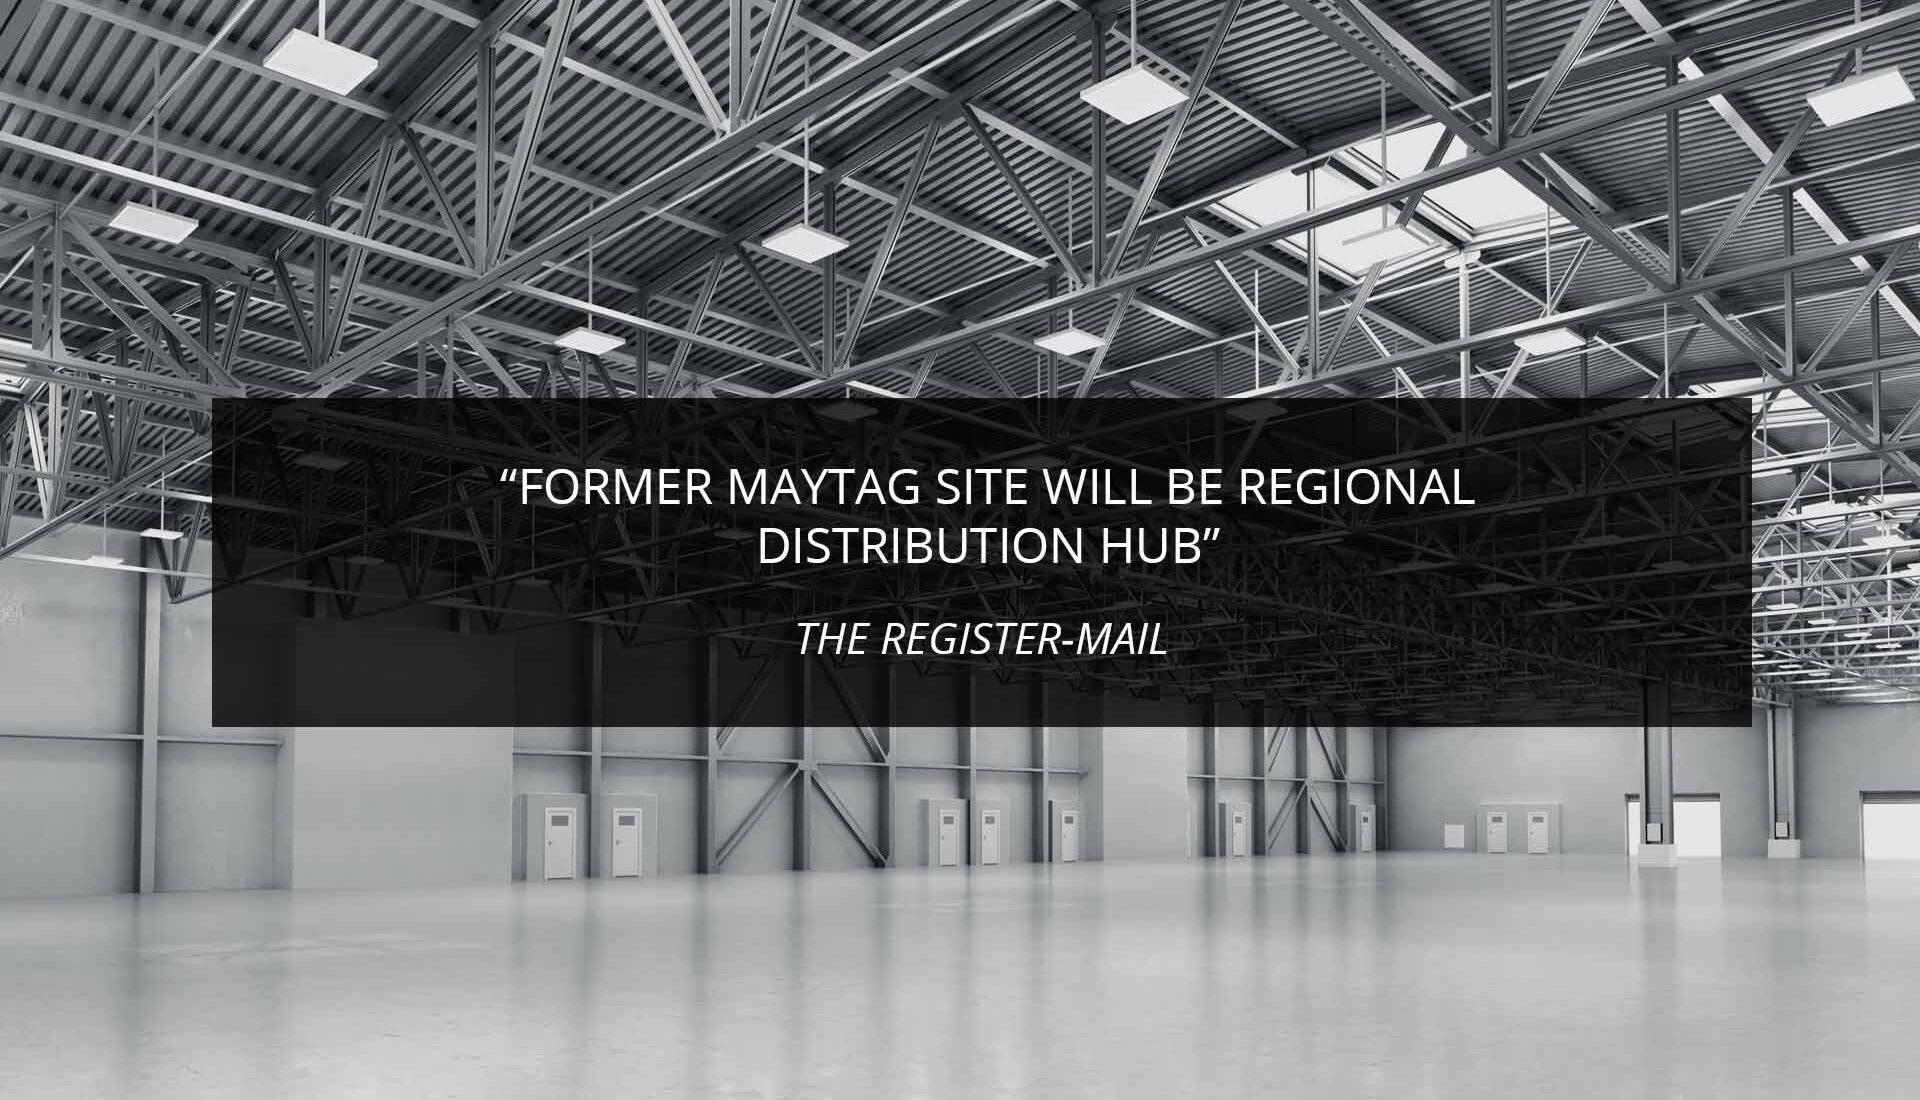 Former Maytag Site Will Be Regional Distribution Hub